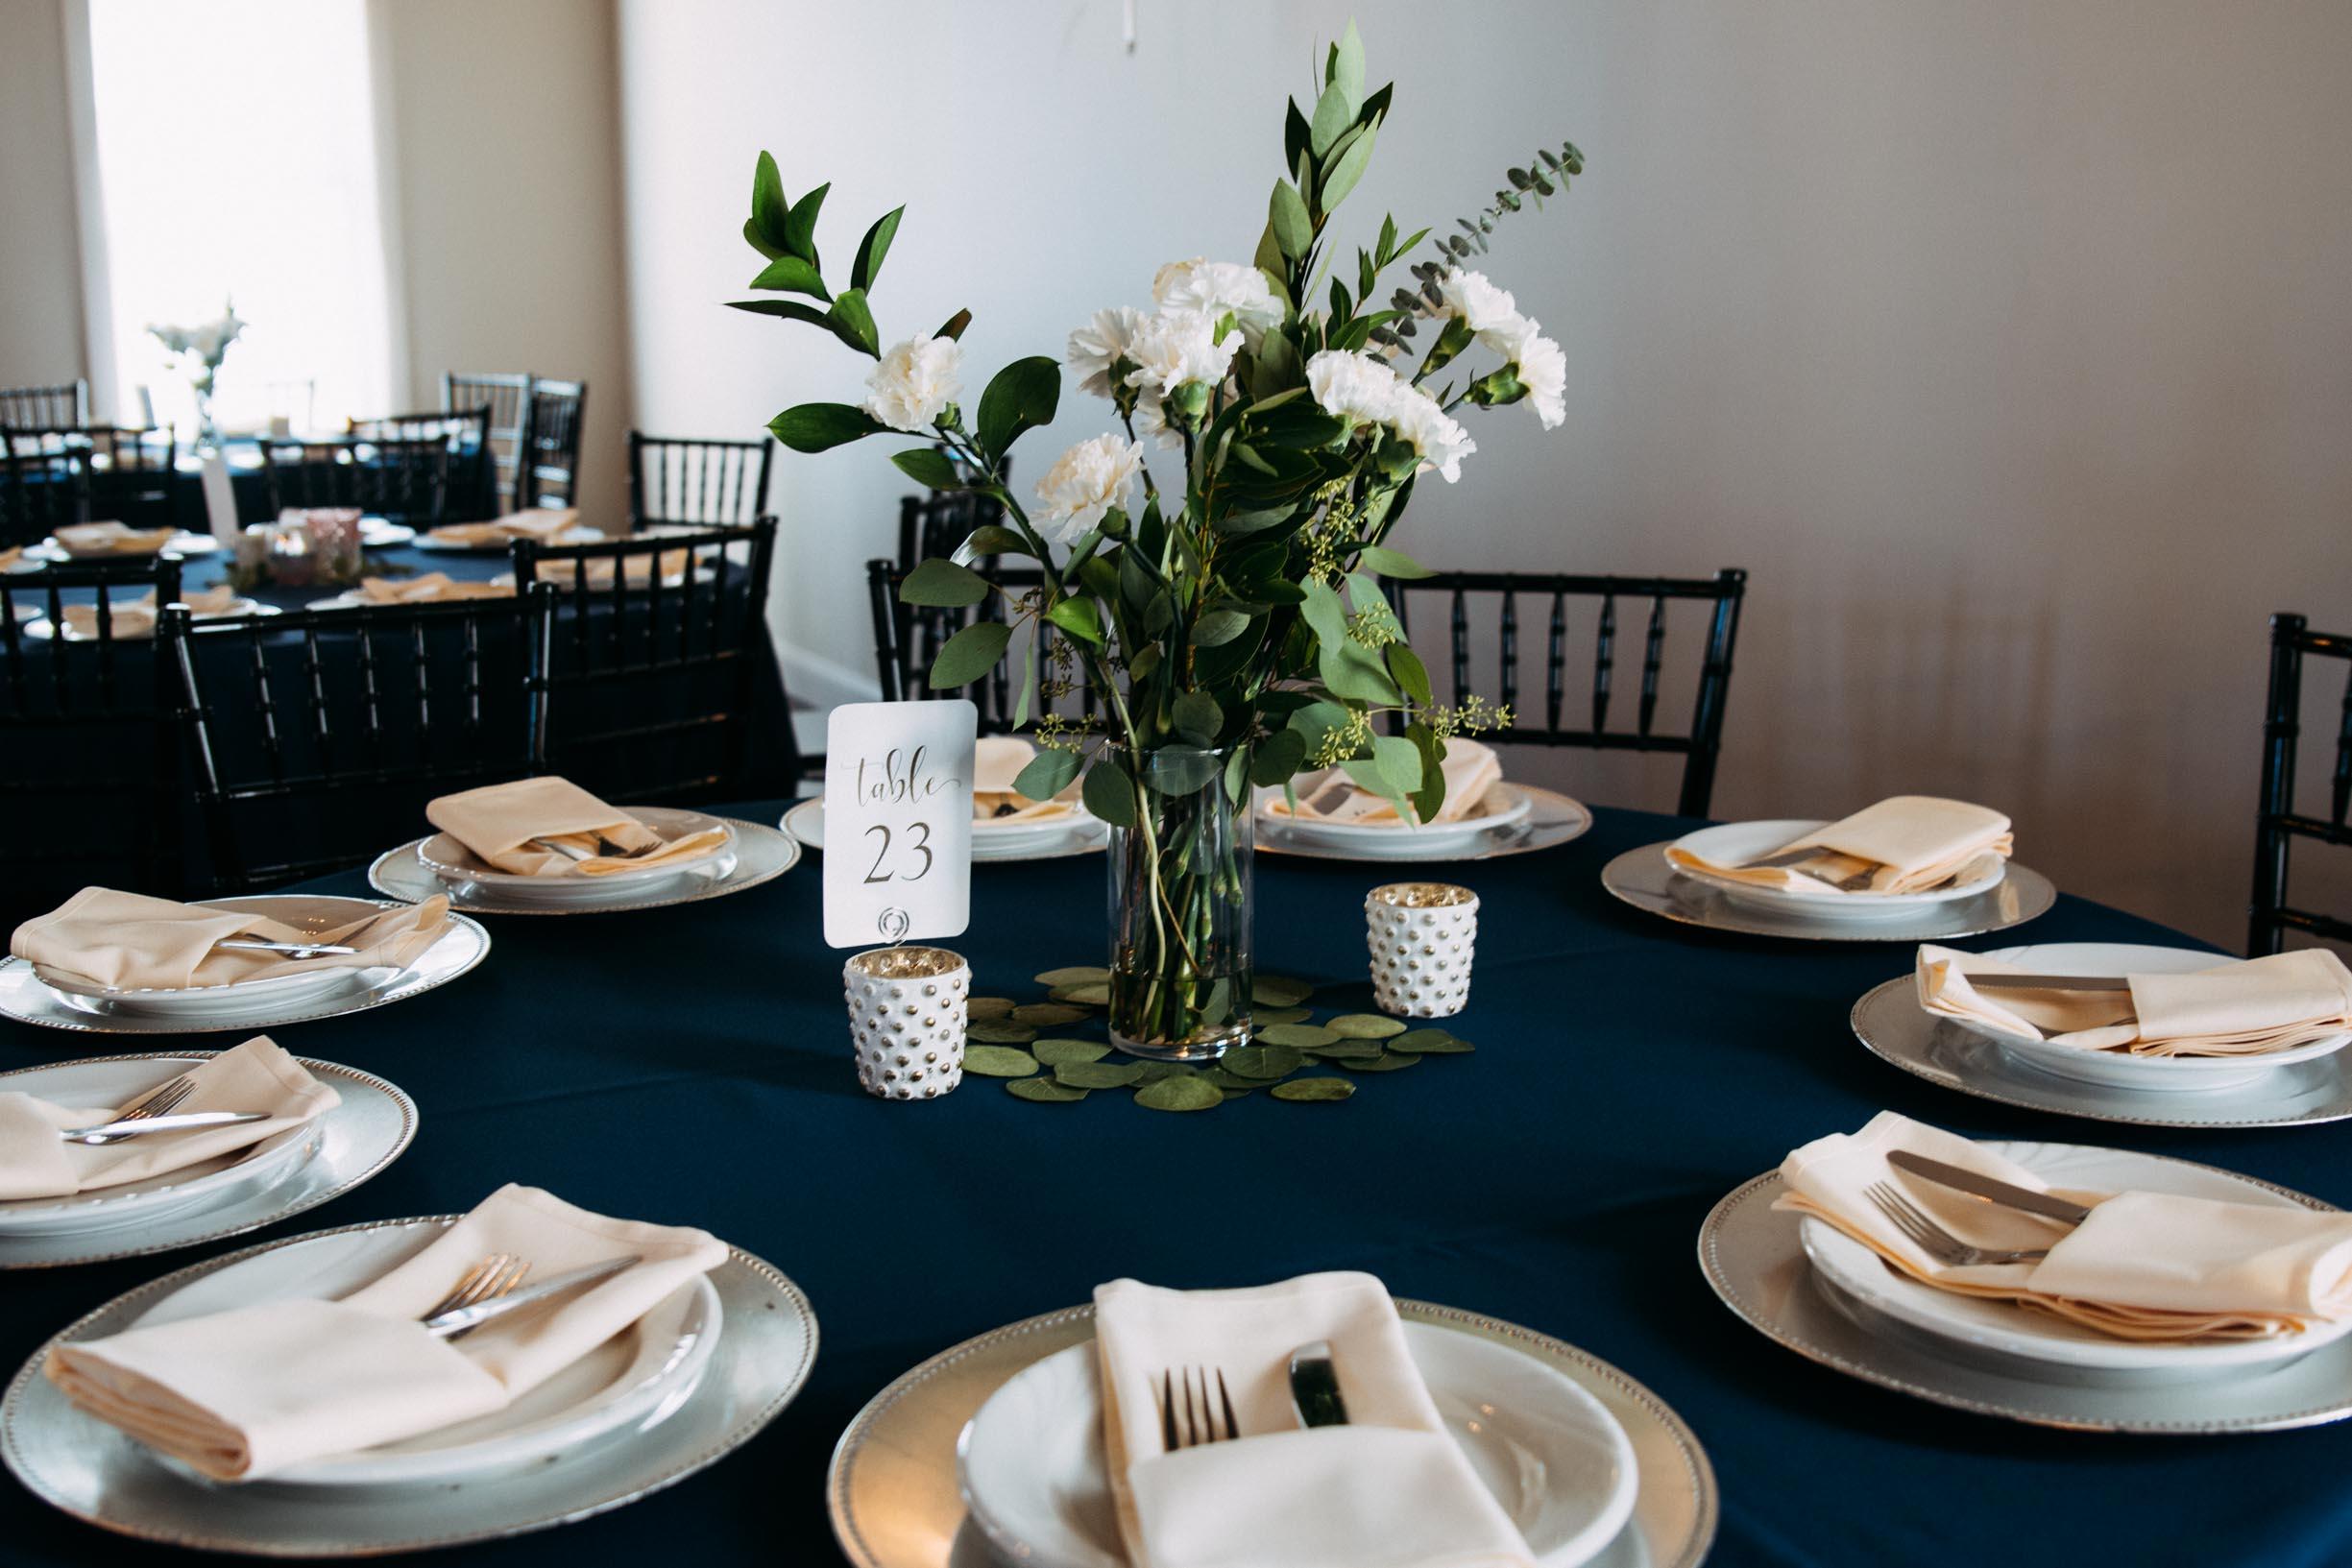 53-WeddingsattheBroz_Minnesota_WeddingBlog_Details.jpg